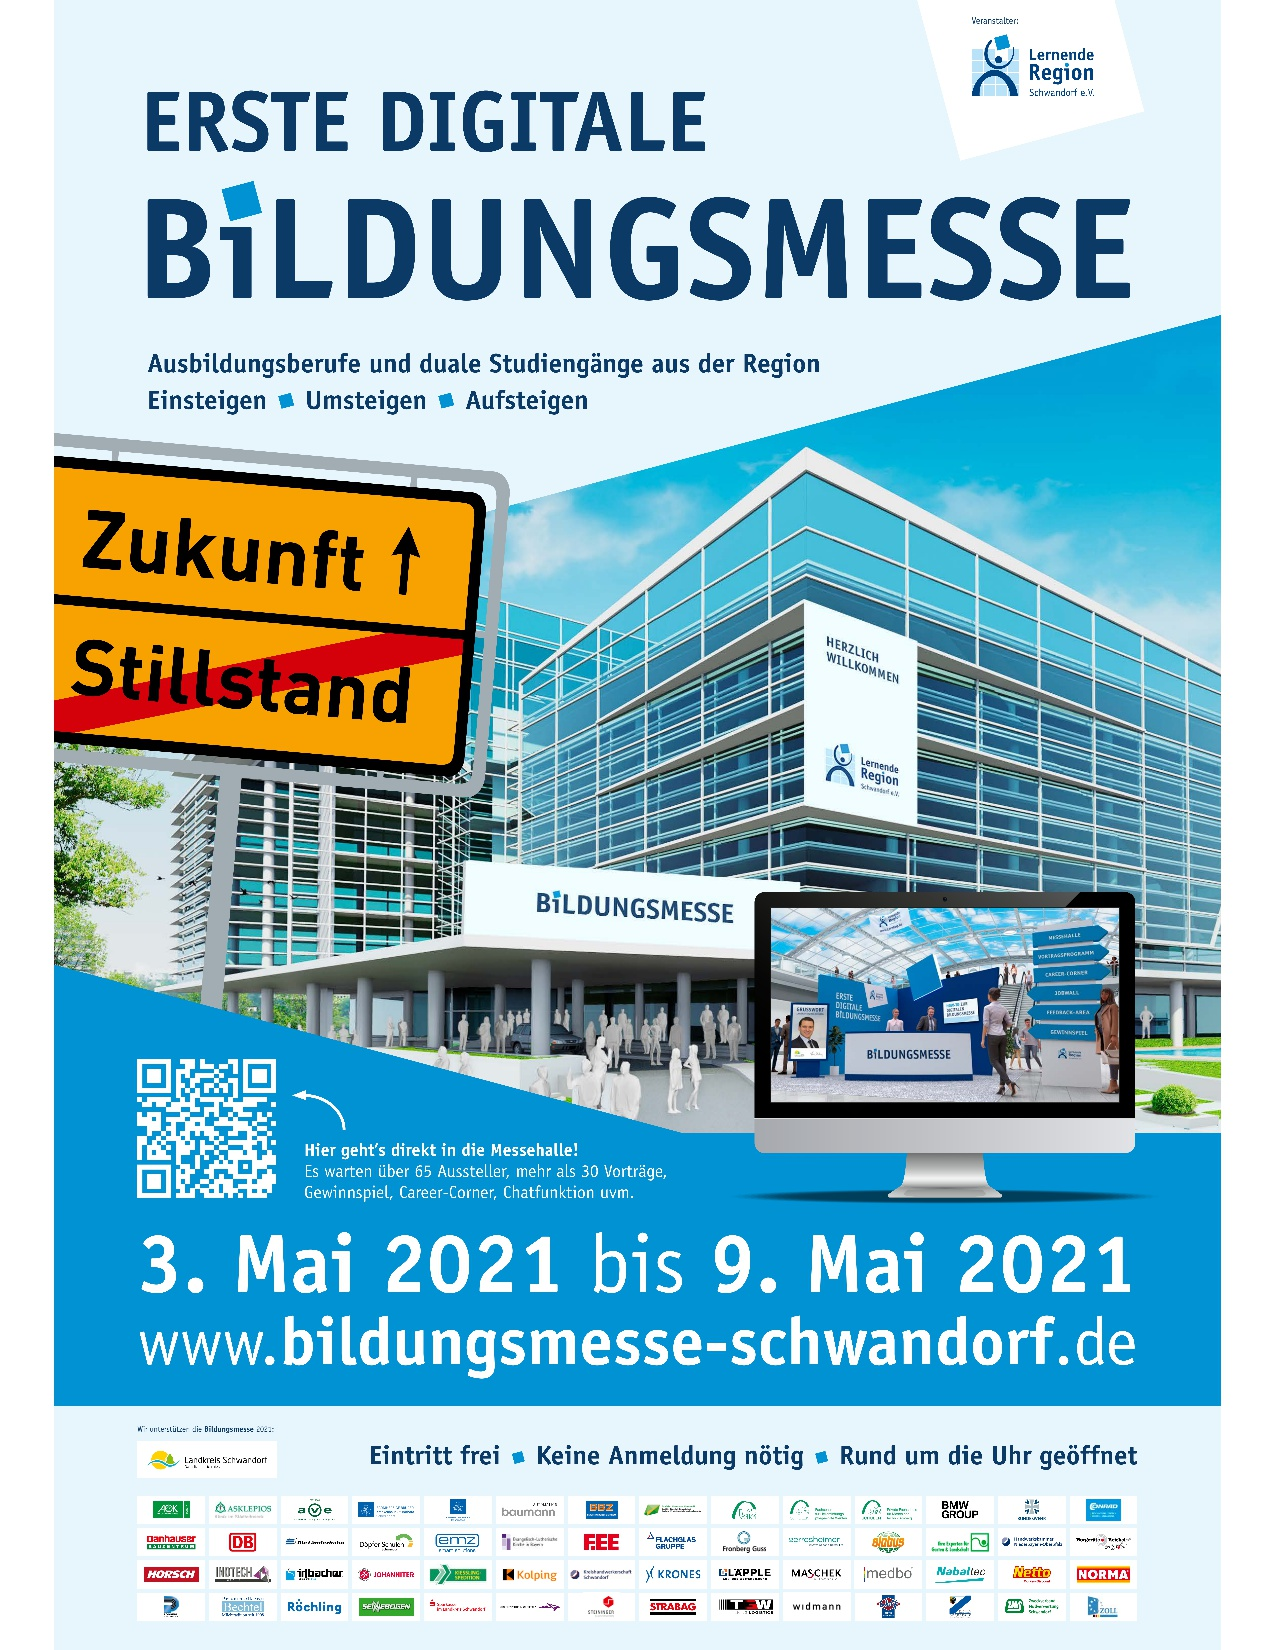 Bildungsmesse_Plakat